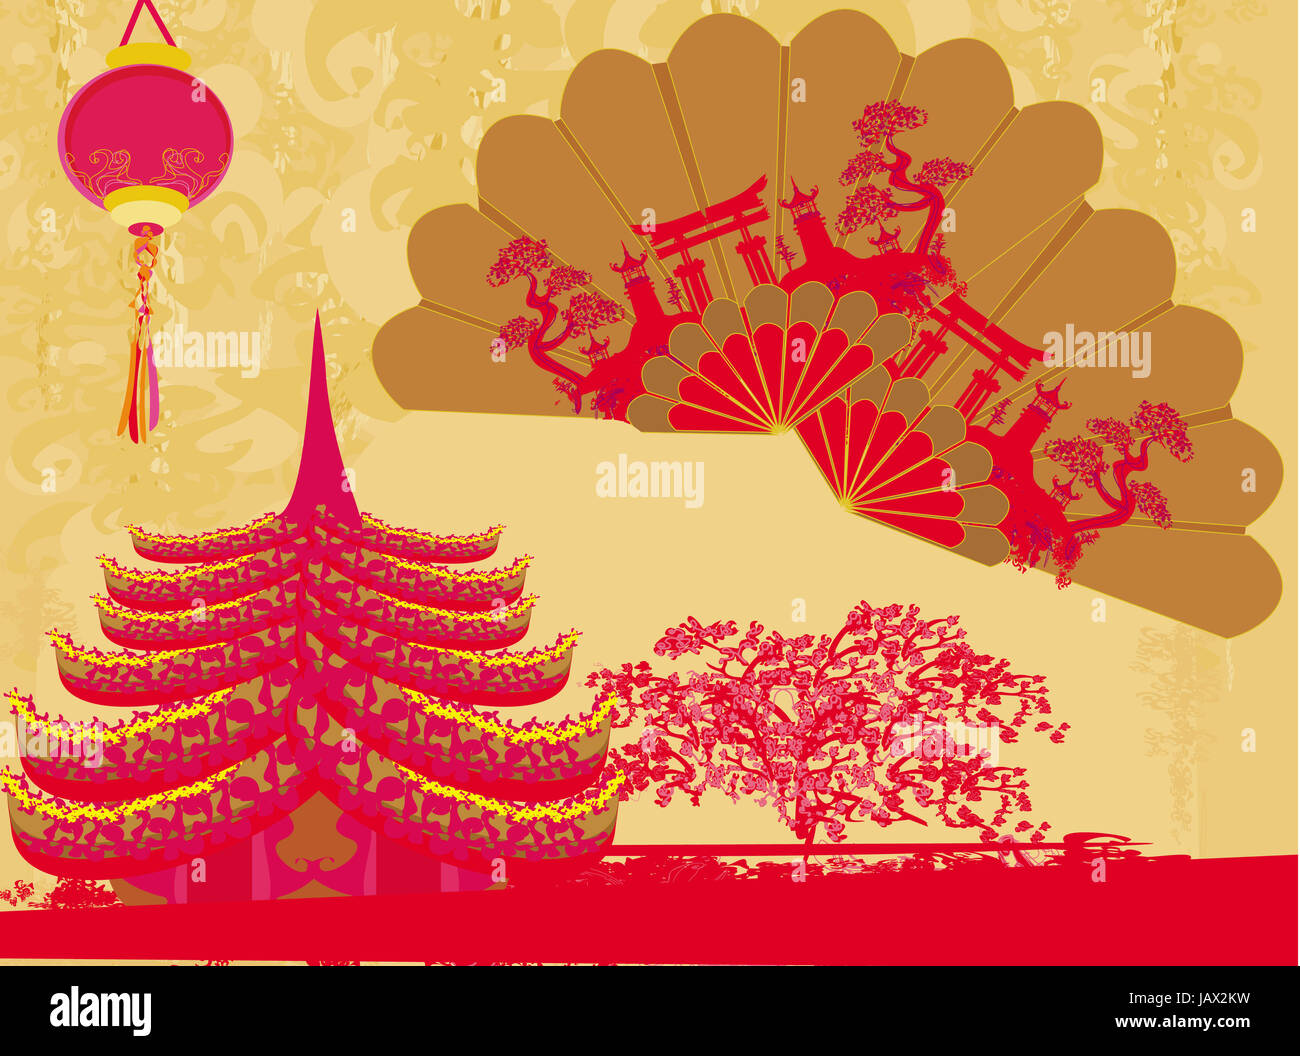 Decorative Traditional Lanterns Chinese Landscape Beautiful